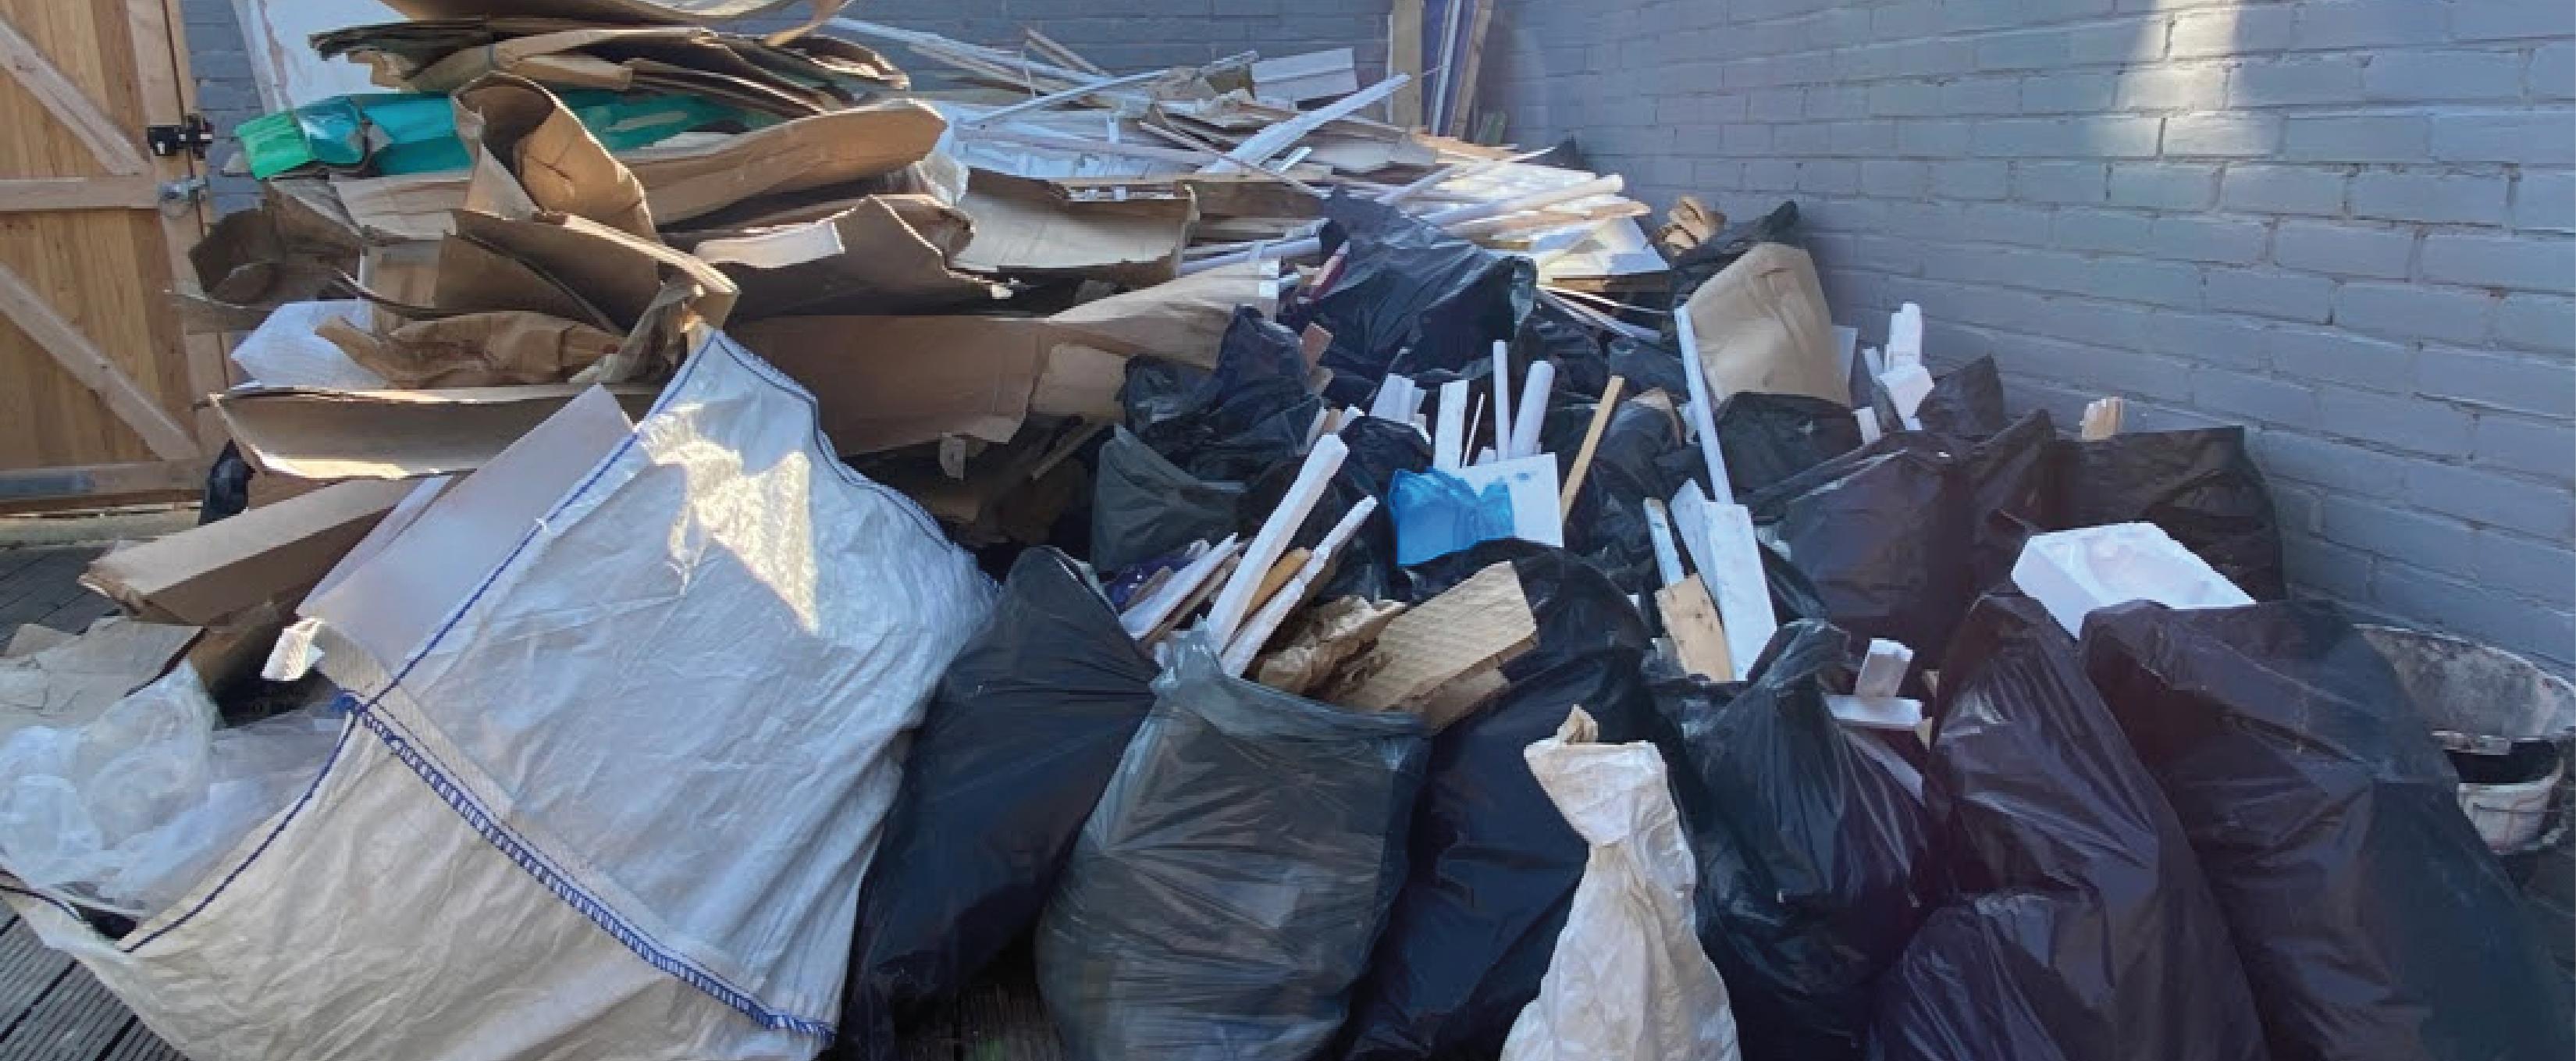 trade waste builders refurbishment renovation price of listings lovejunk